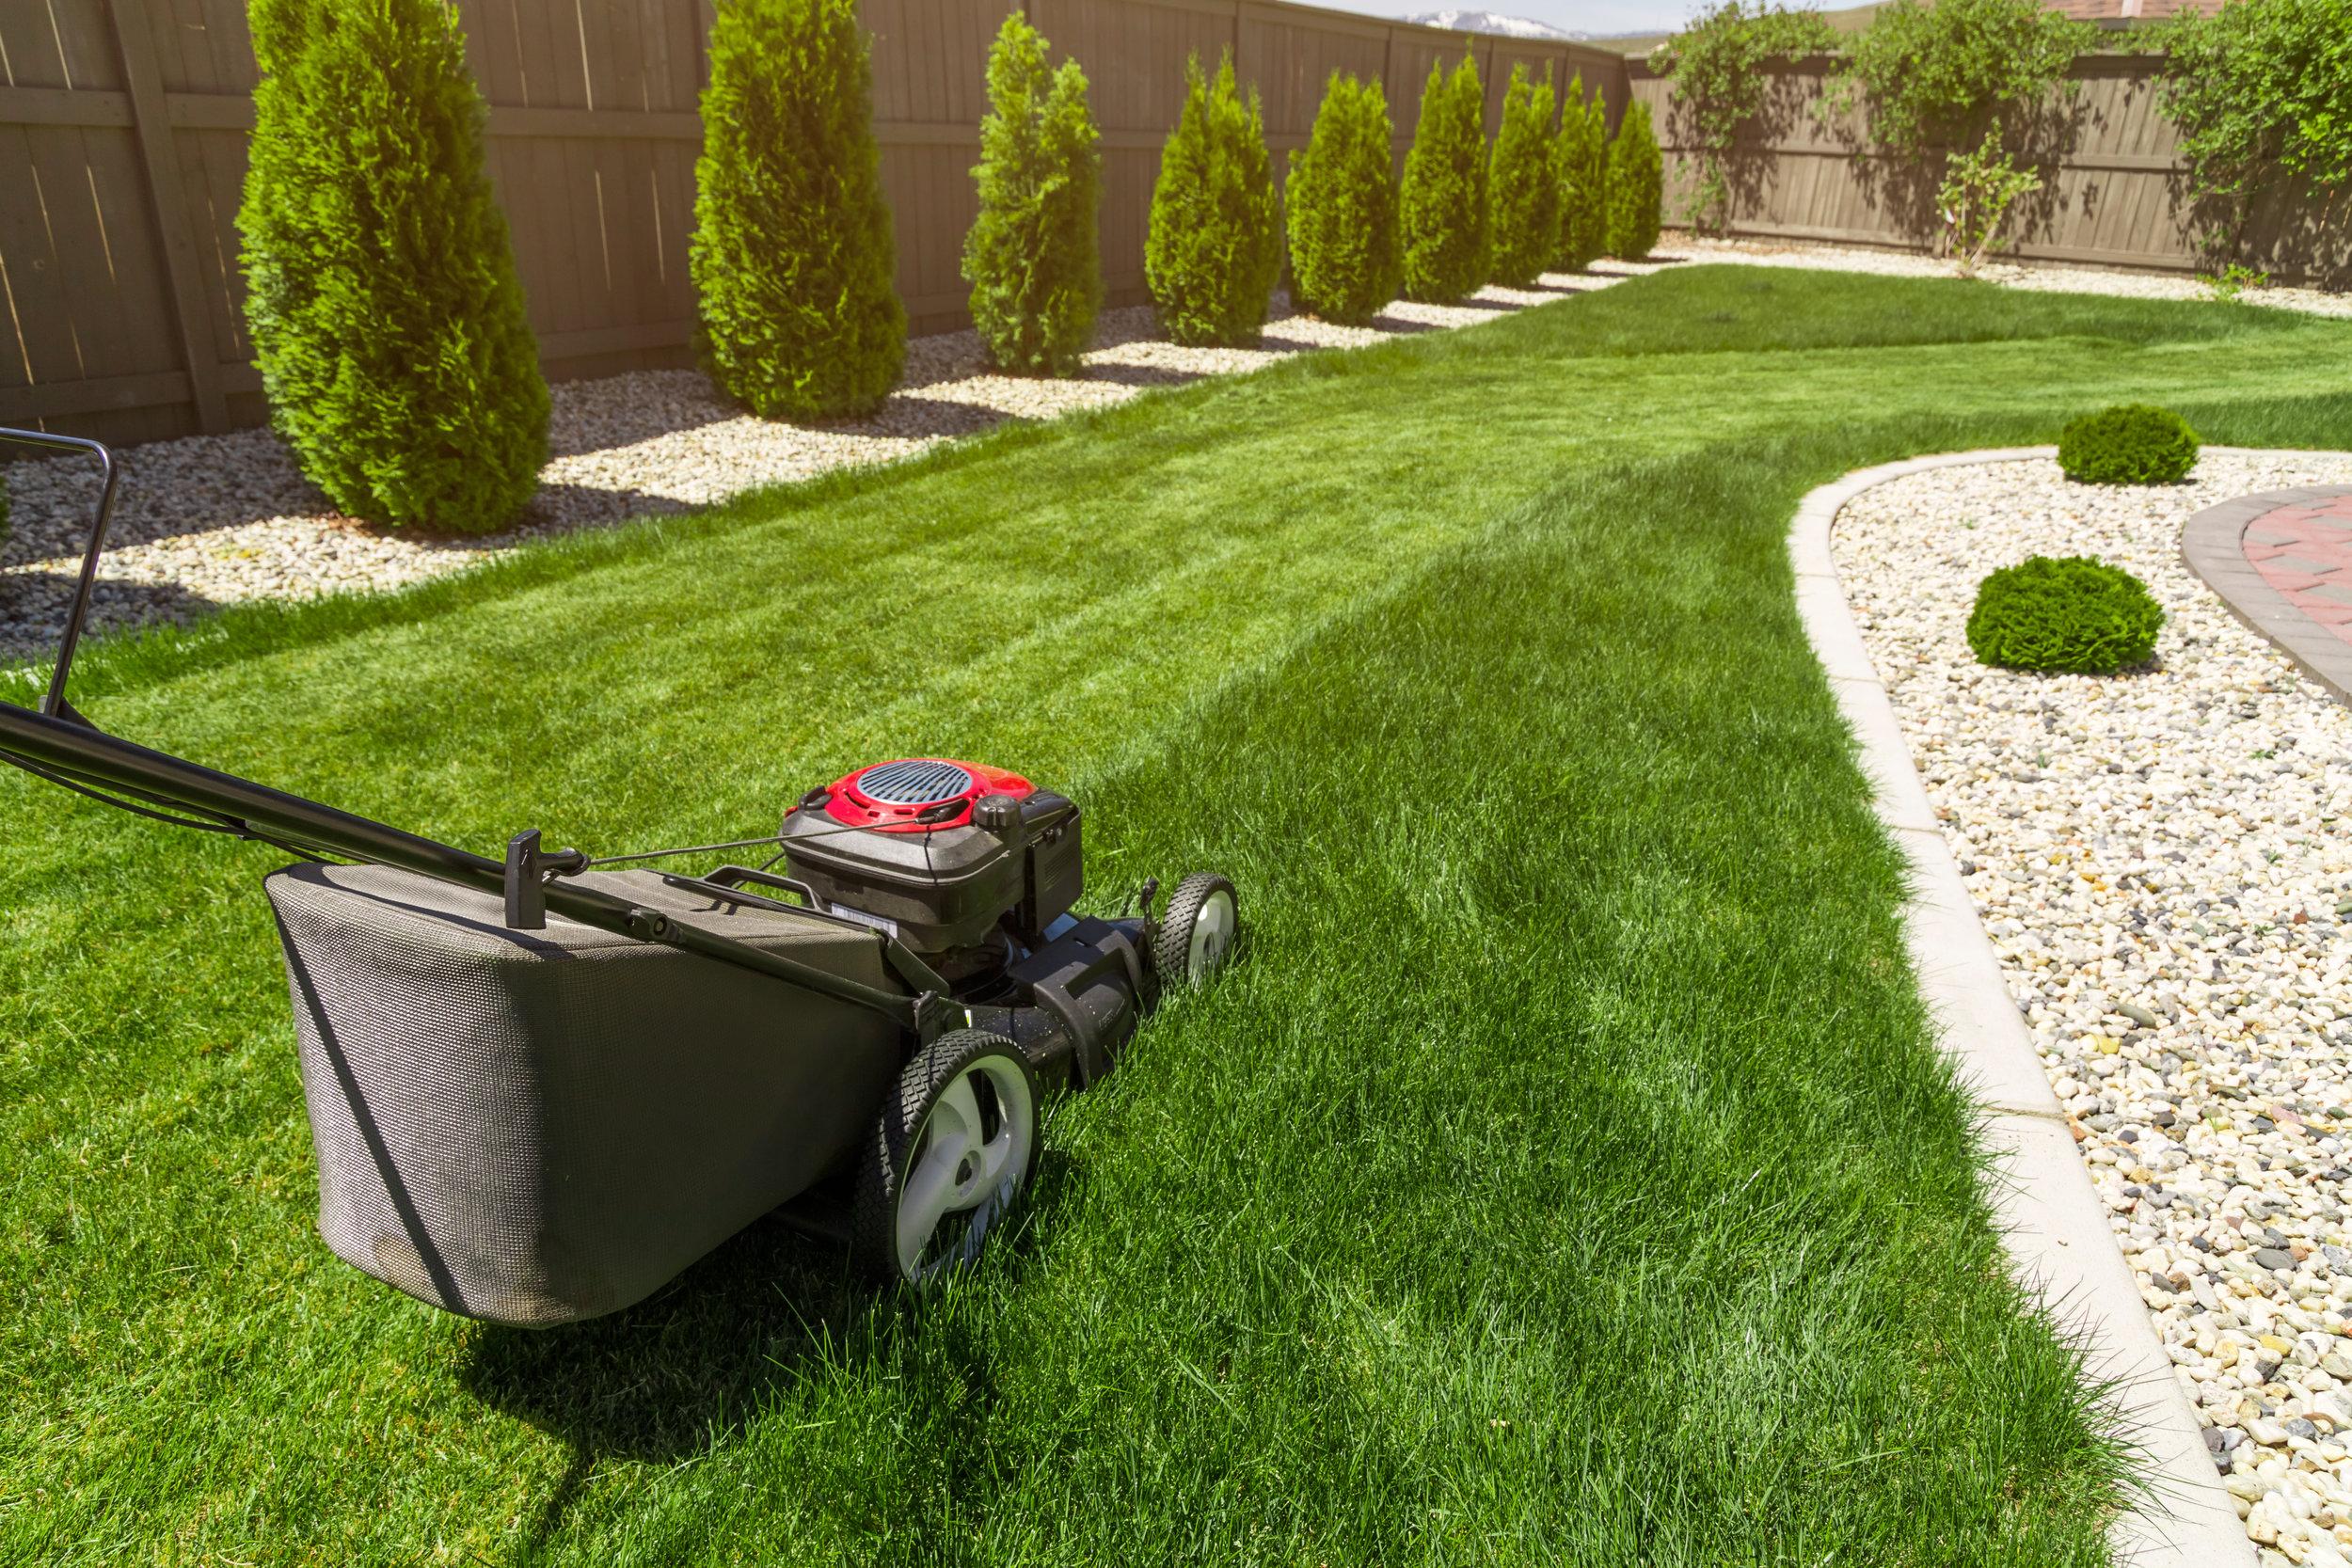 lawn-mower-PBXTHML.jpg